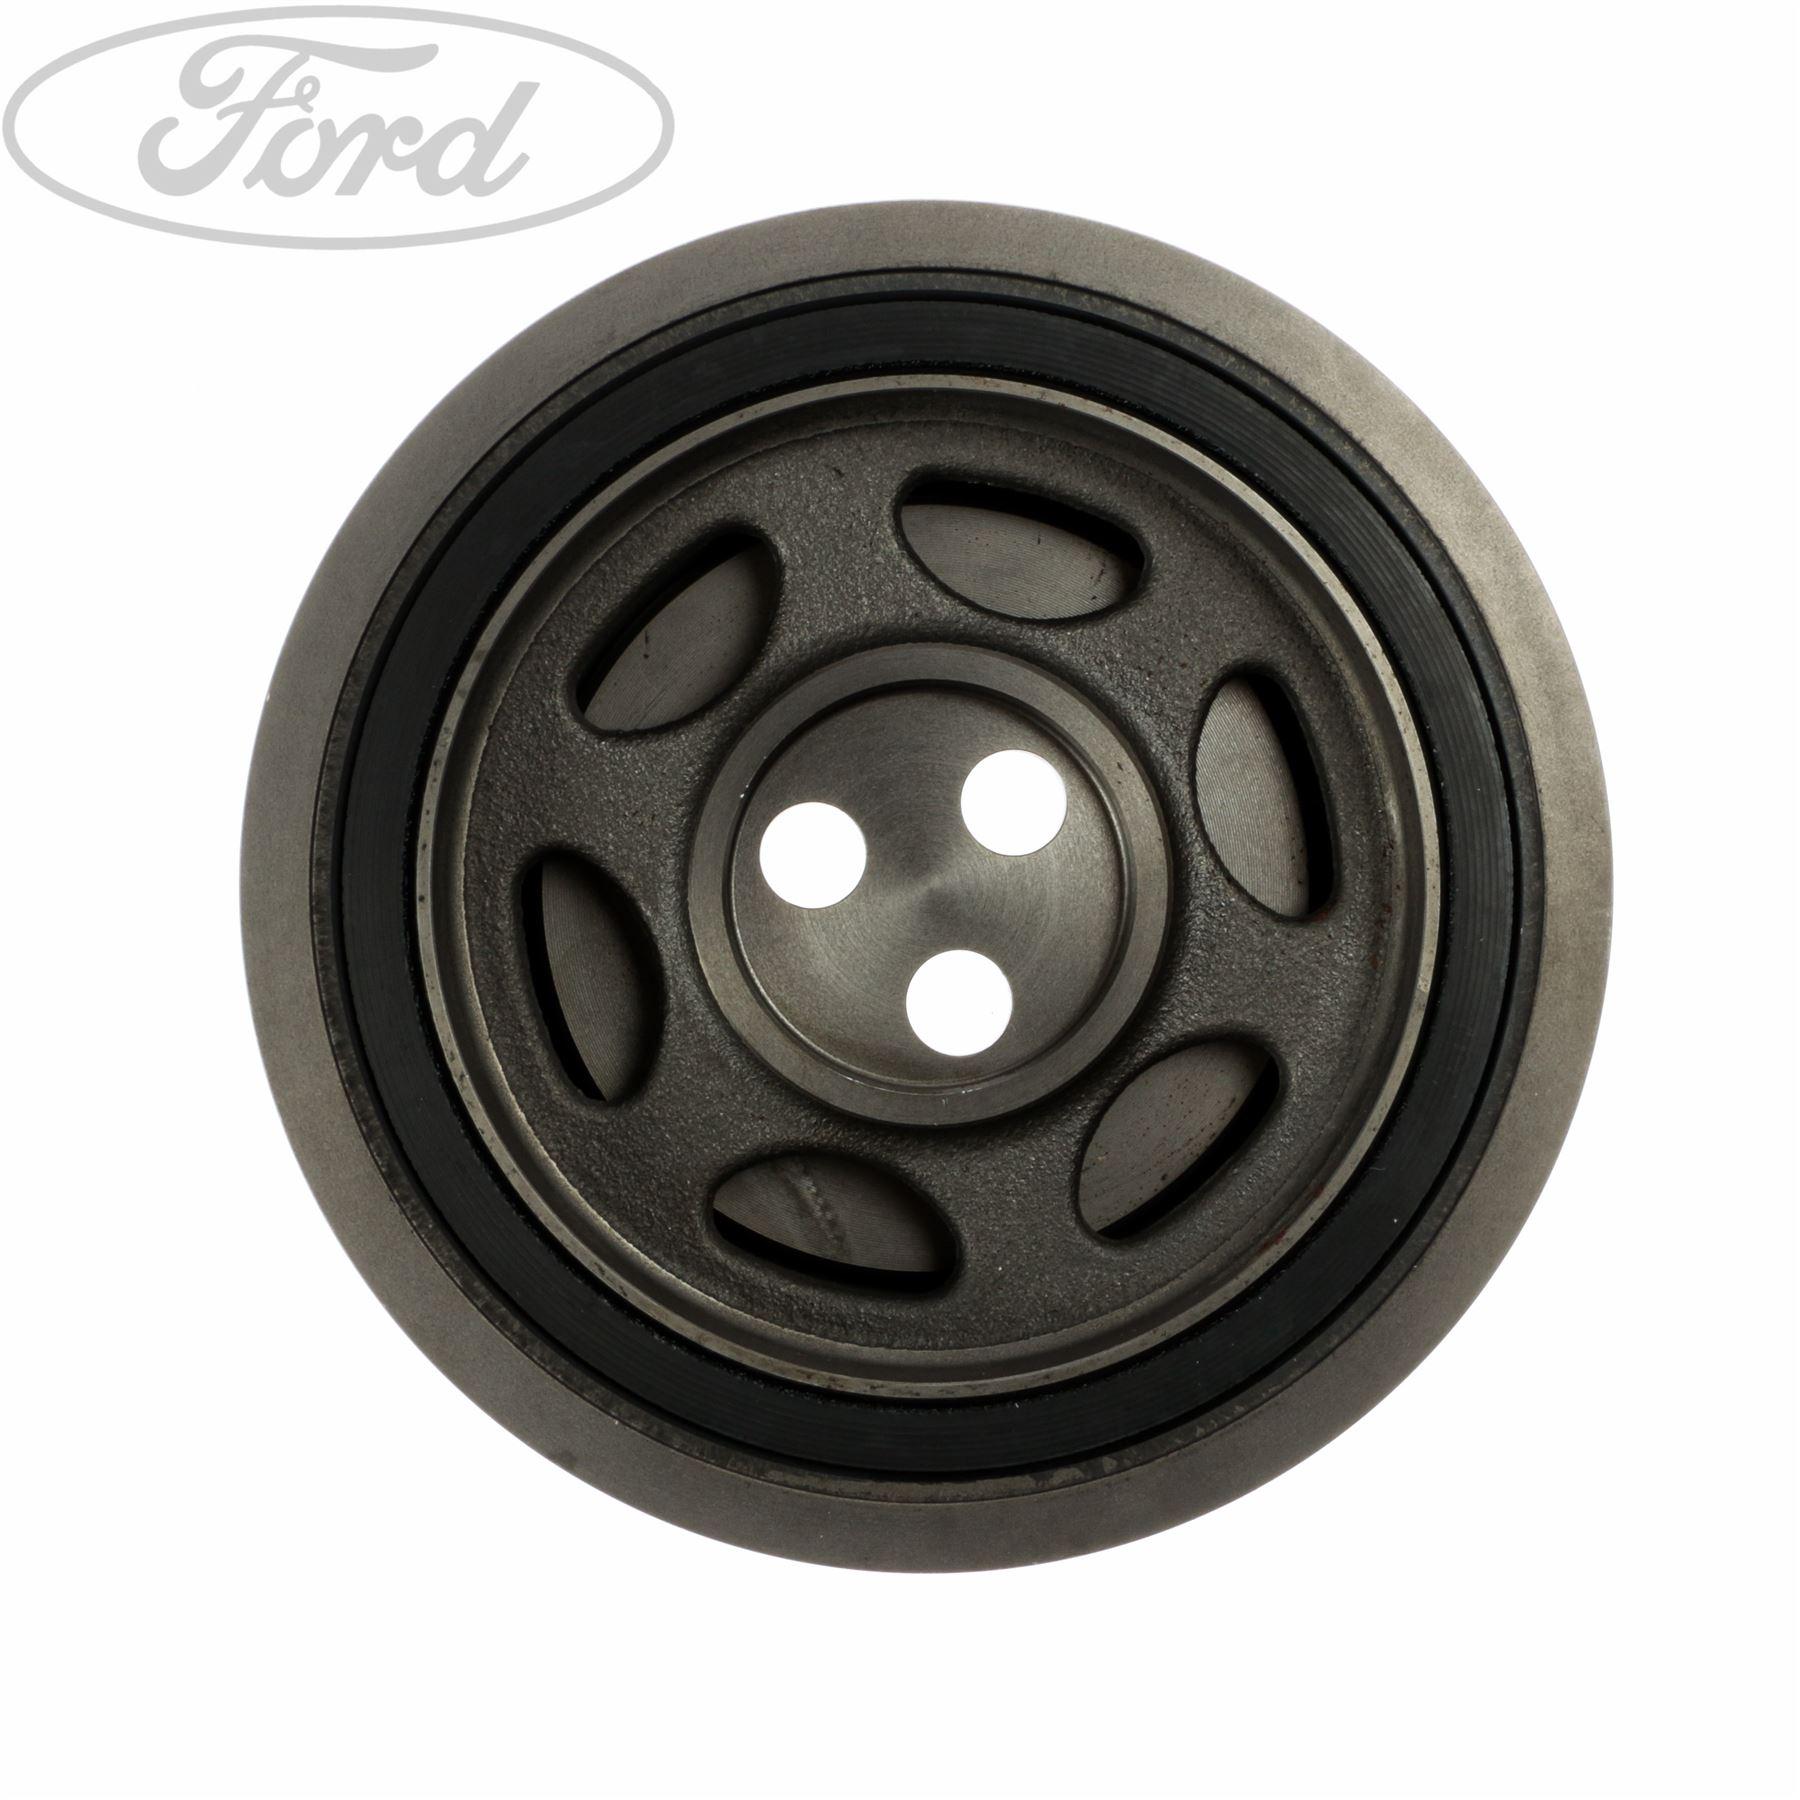 Genuine Ford Ranger 3.2 TDCI Crankshaft Belt Pulley 7PK